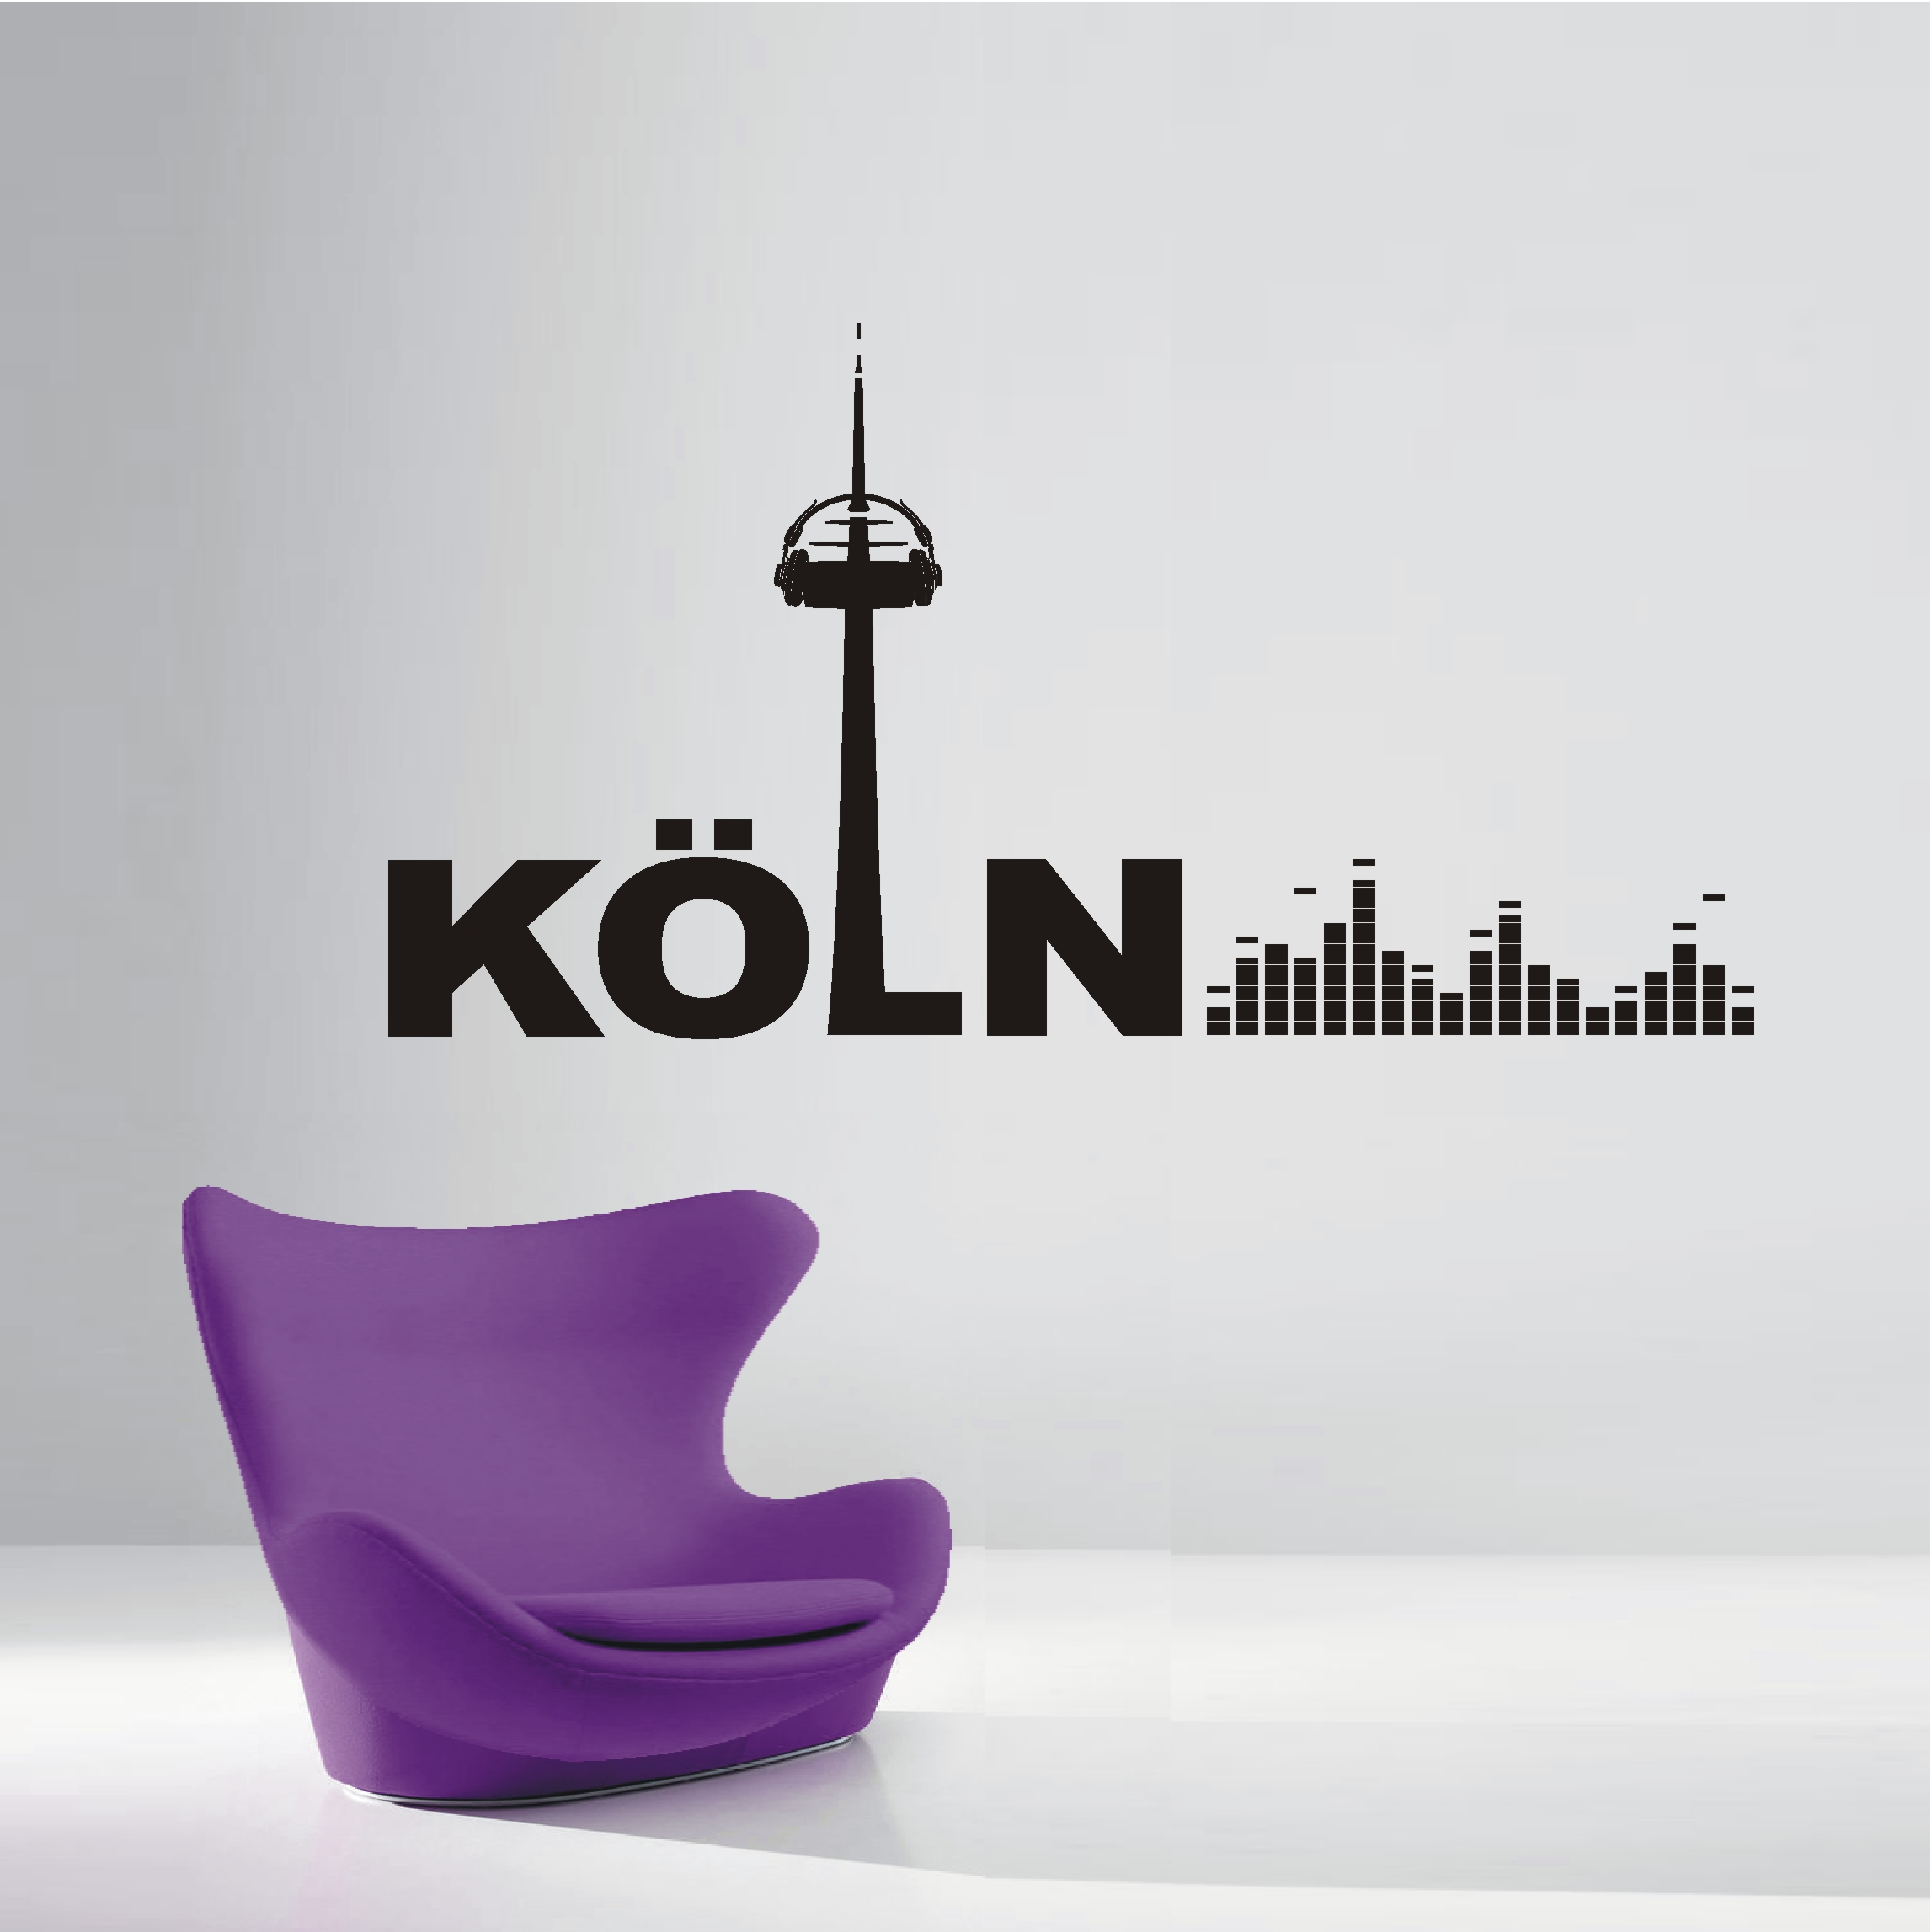 Ansprechend Wandtattoo Köln Referenz Von Deko-shop-24.de-wandtattoo-köln Music